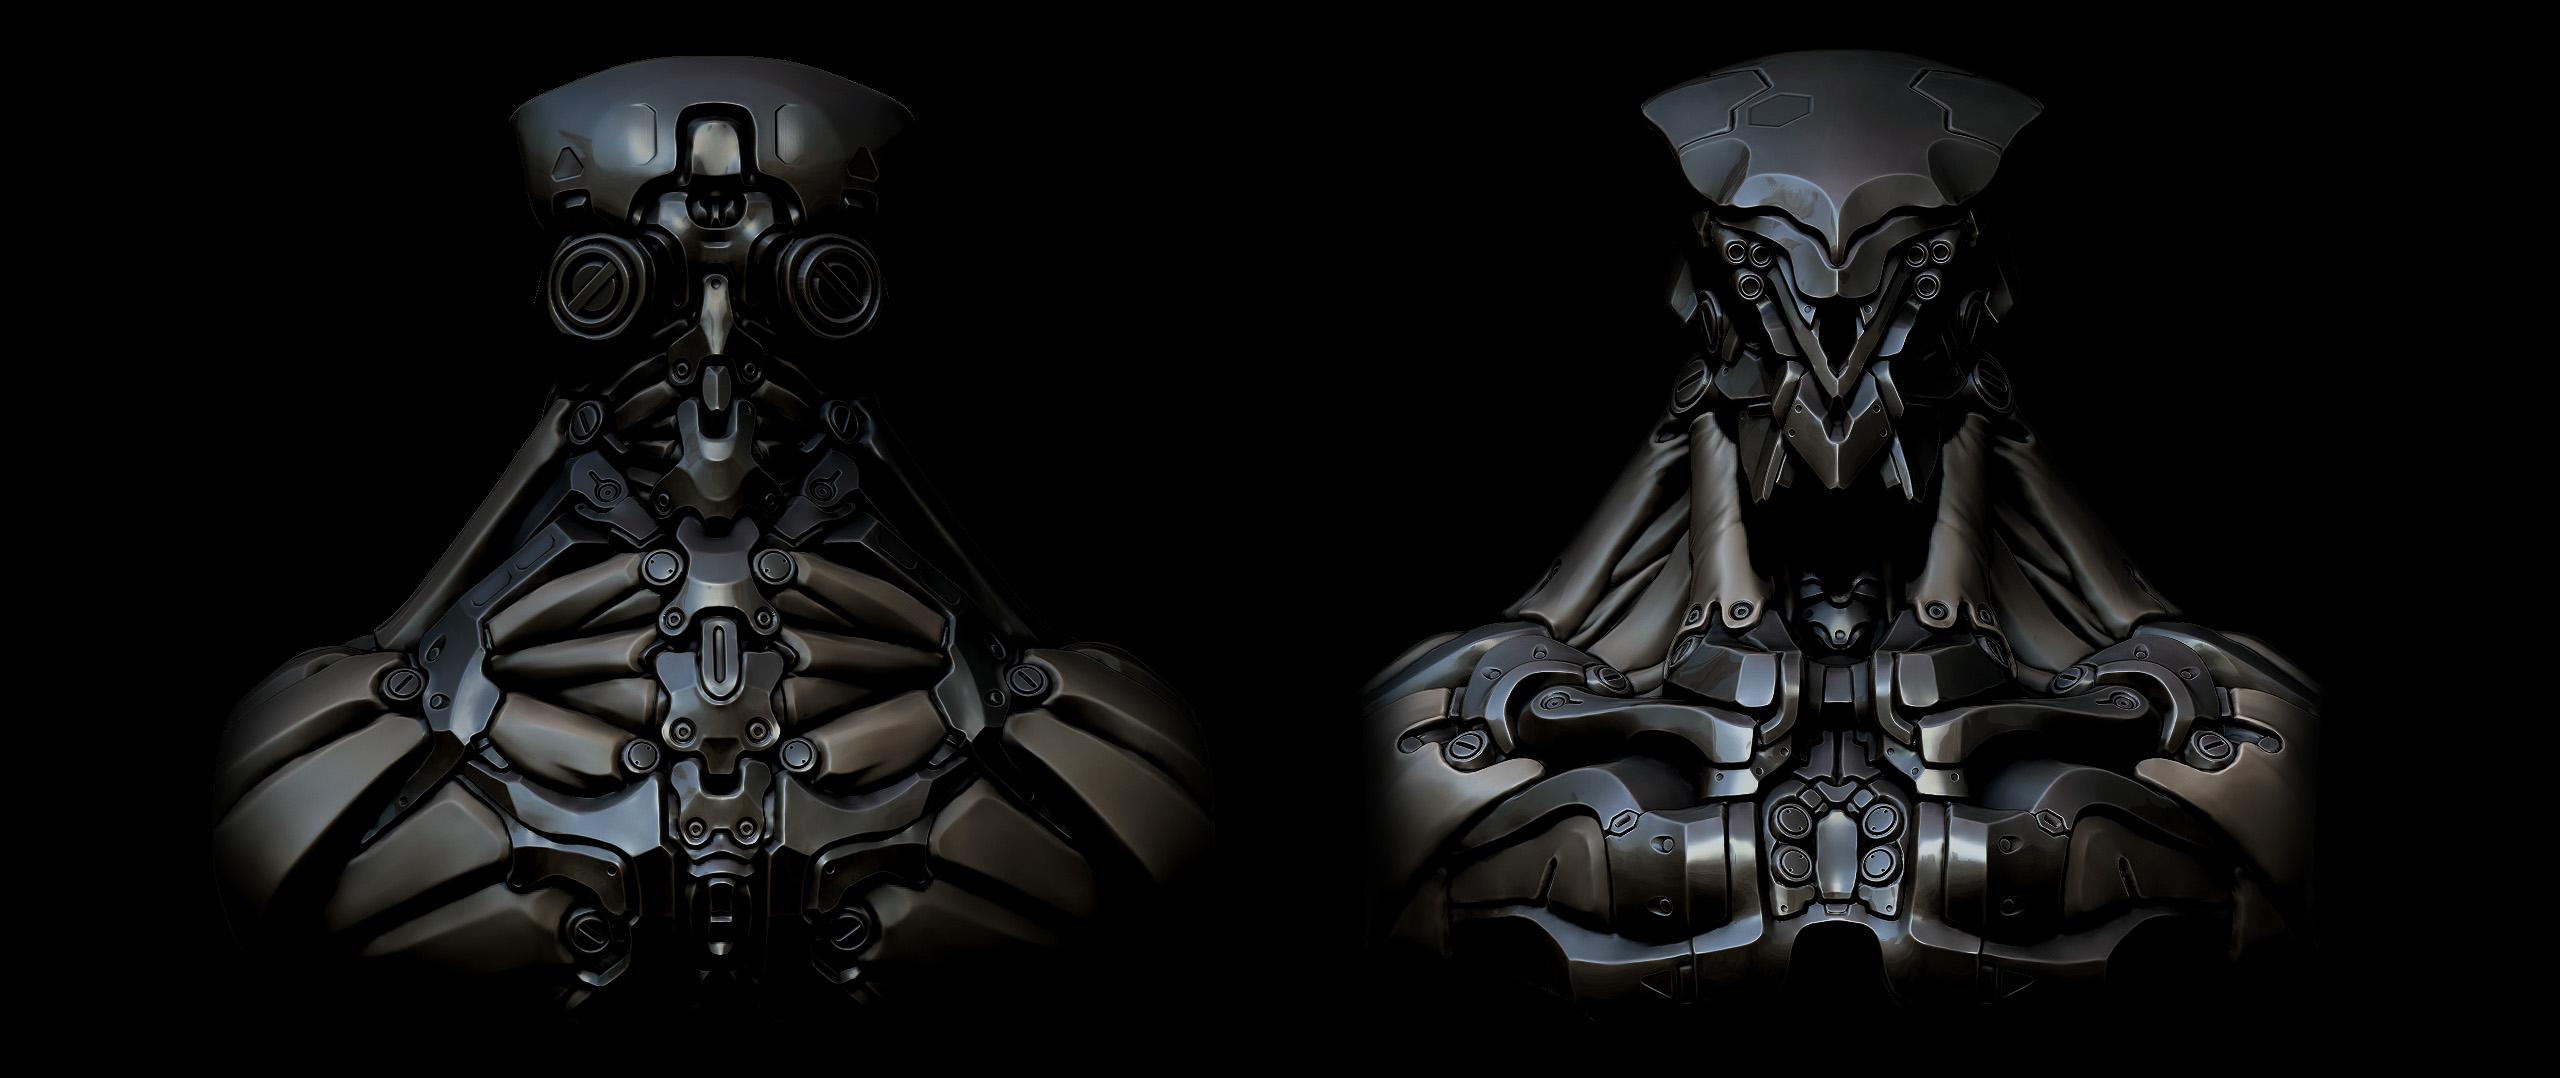 Robot Wallpaper (Clean version) by panick